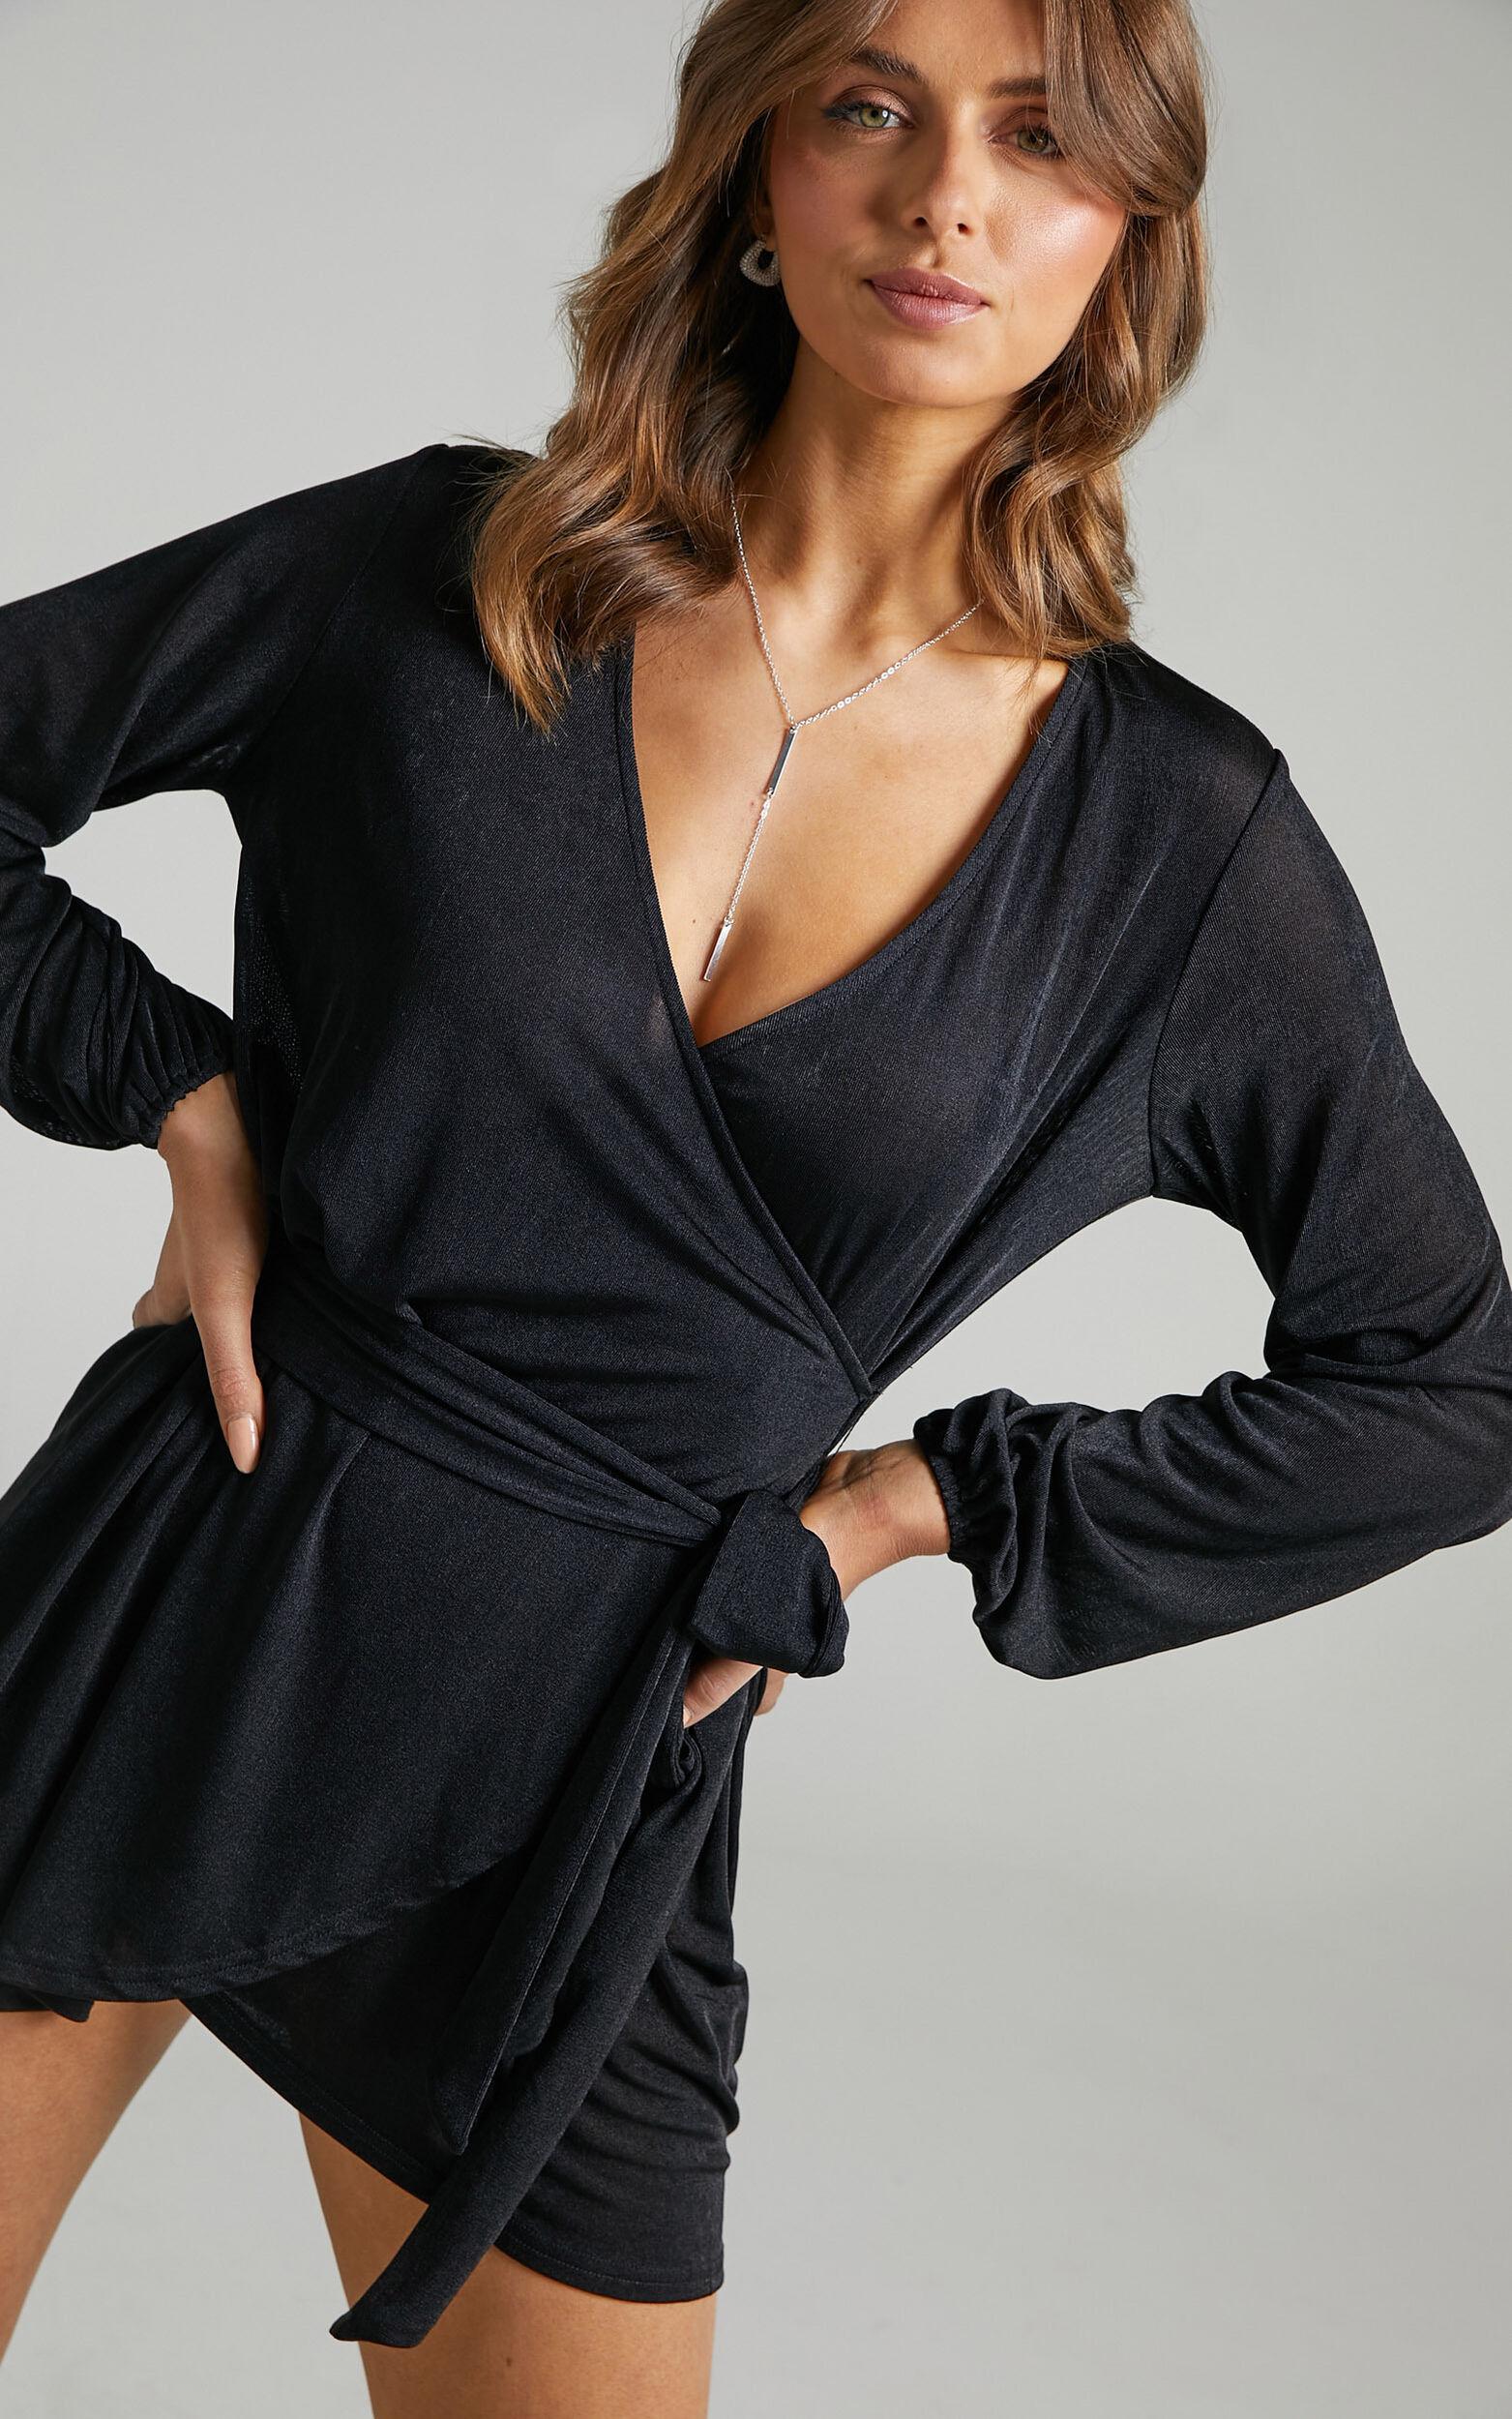 Kayley Wrap Centre Tie Mini Dress in Black - 06, BLK1, super-hi-res image number null